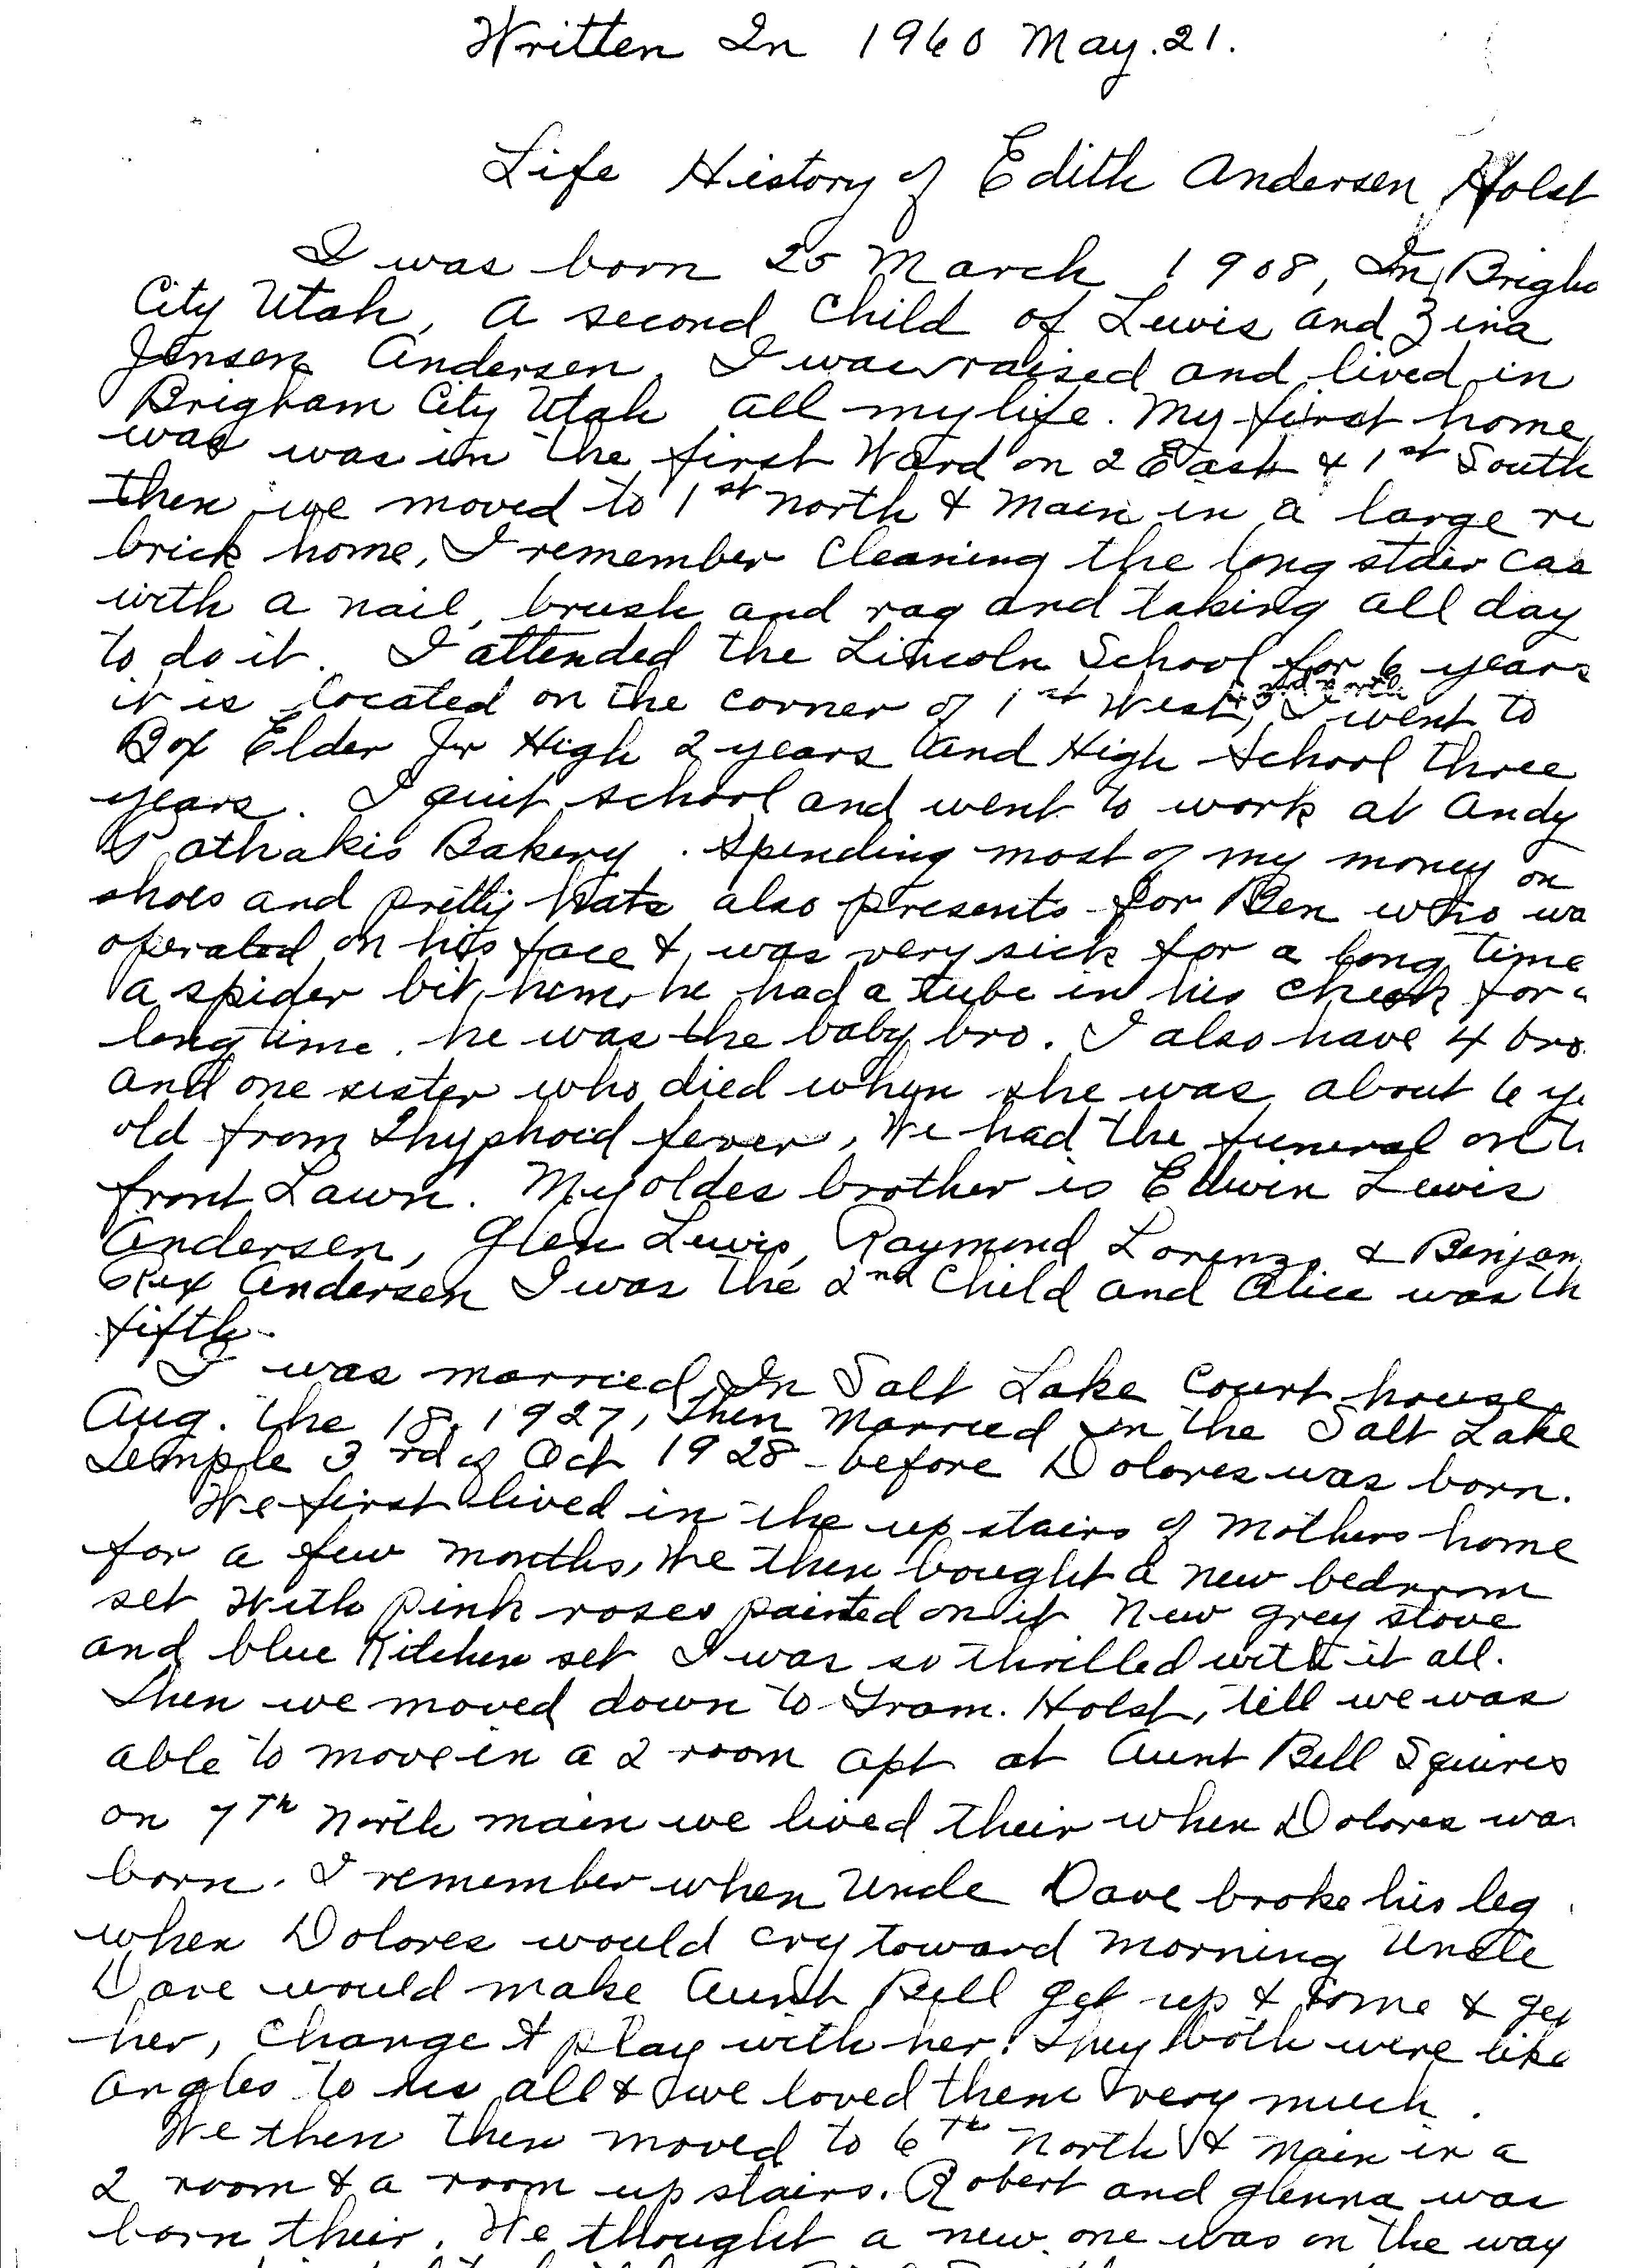 Edith Andersen Holst life history part 1